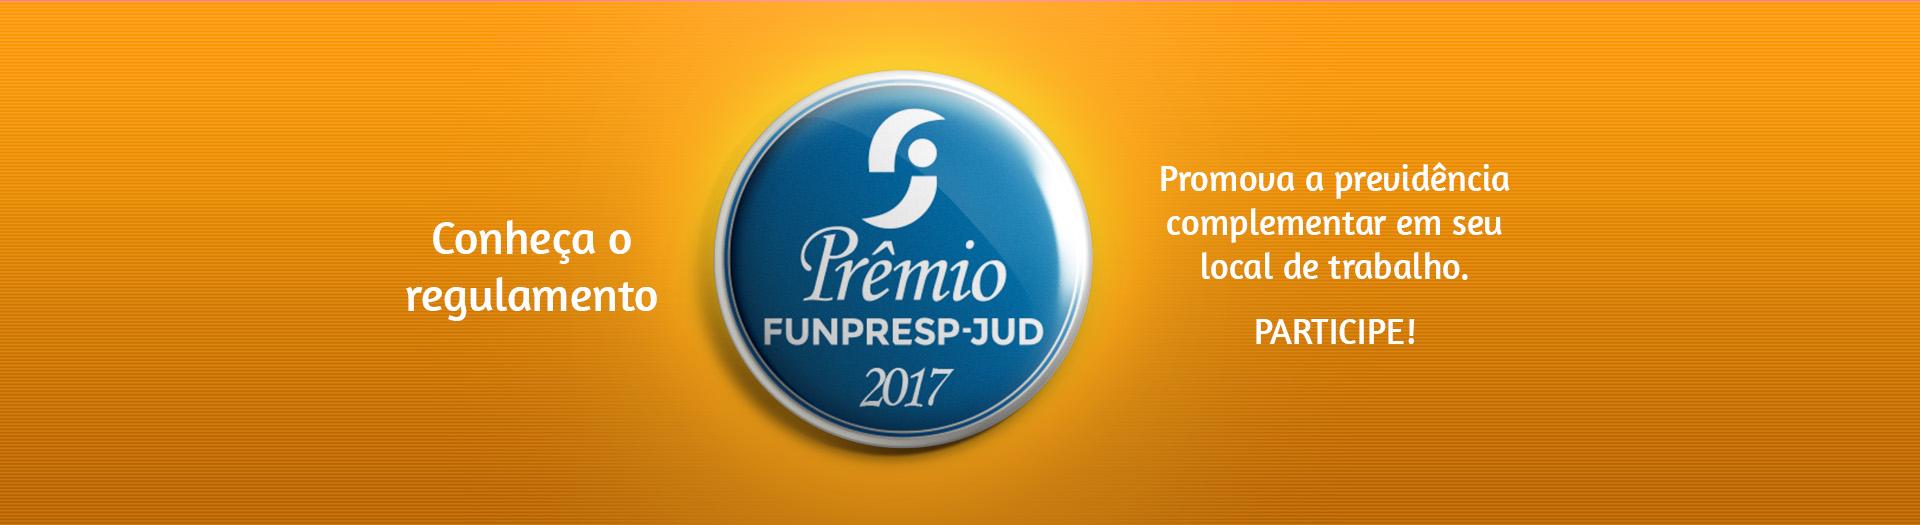 Premio_FunprespJud_2017_banner_site_regulamento_home